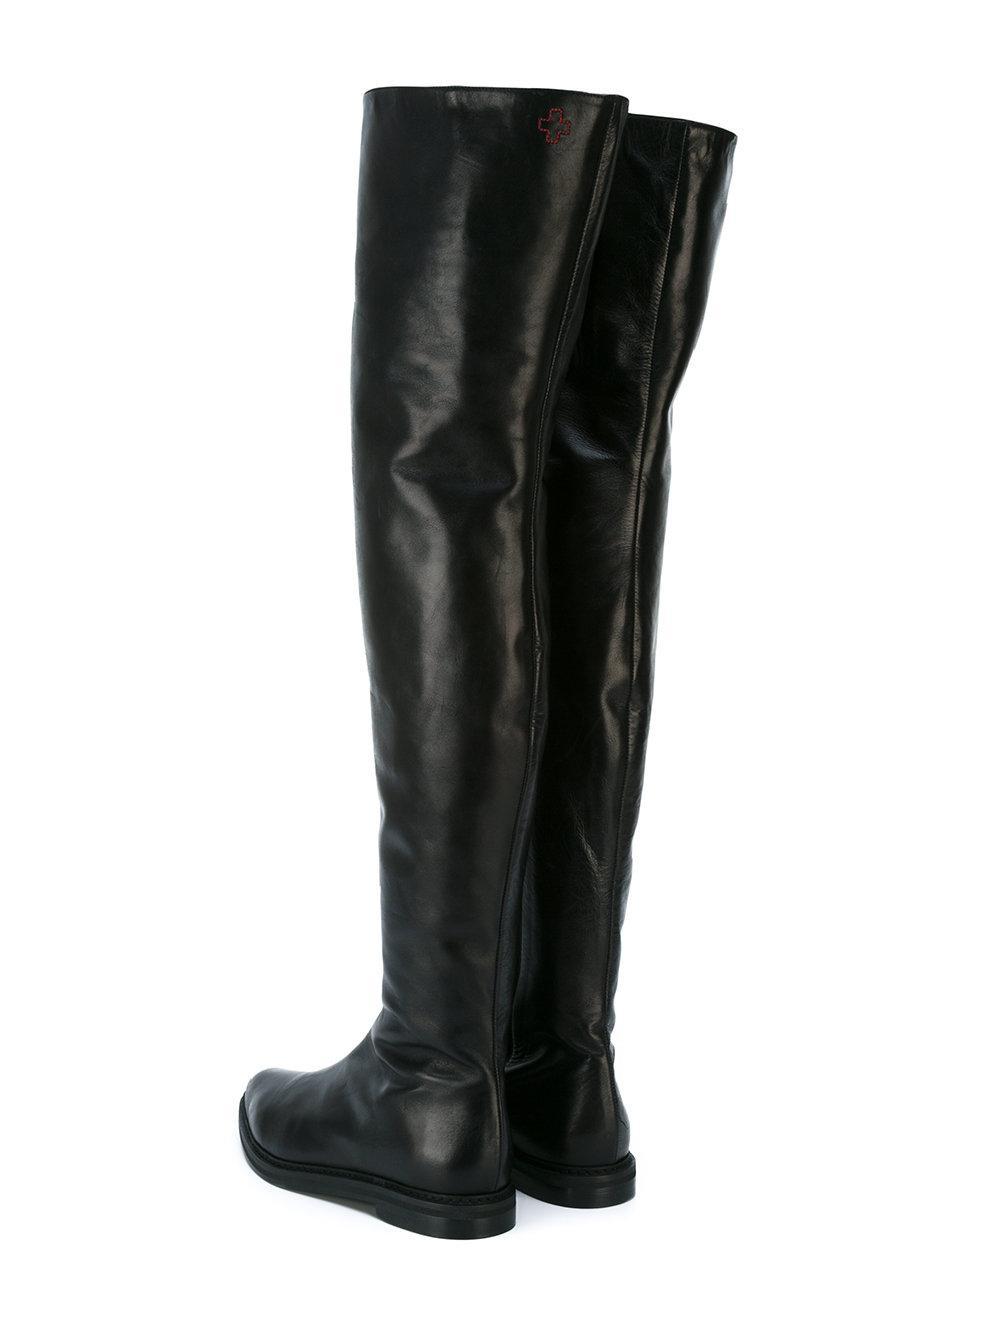 A.F.Vandevorst Leather Over-the-knee Boots in Black